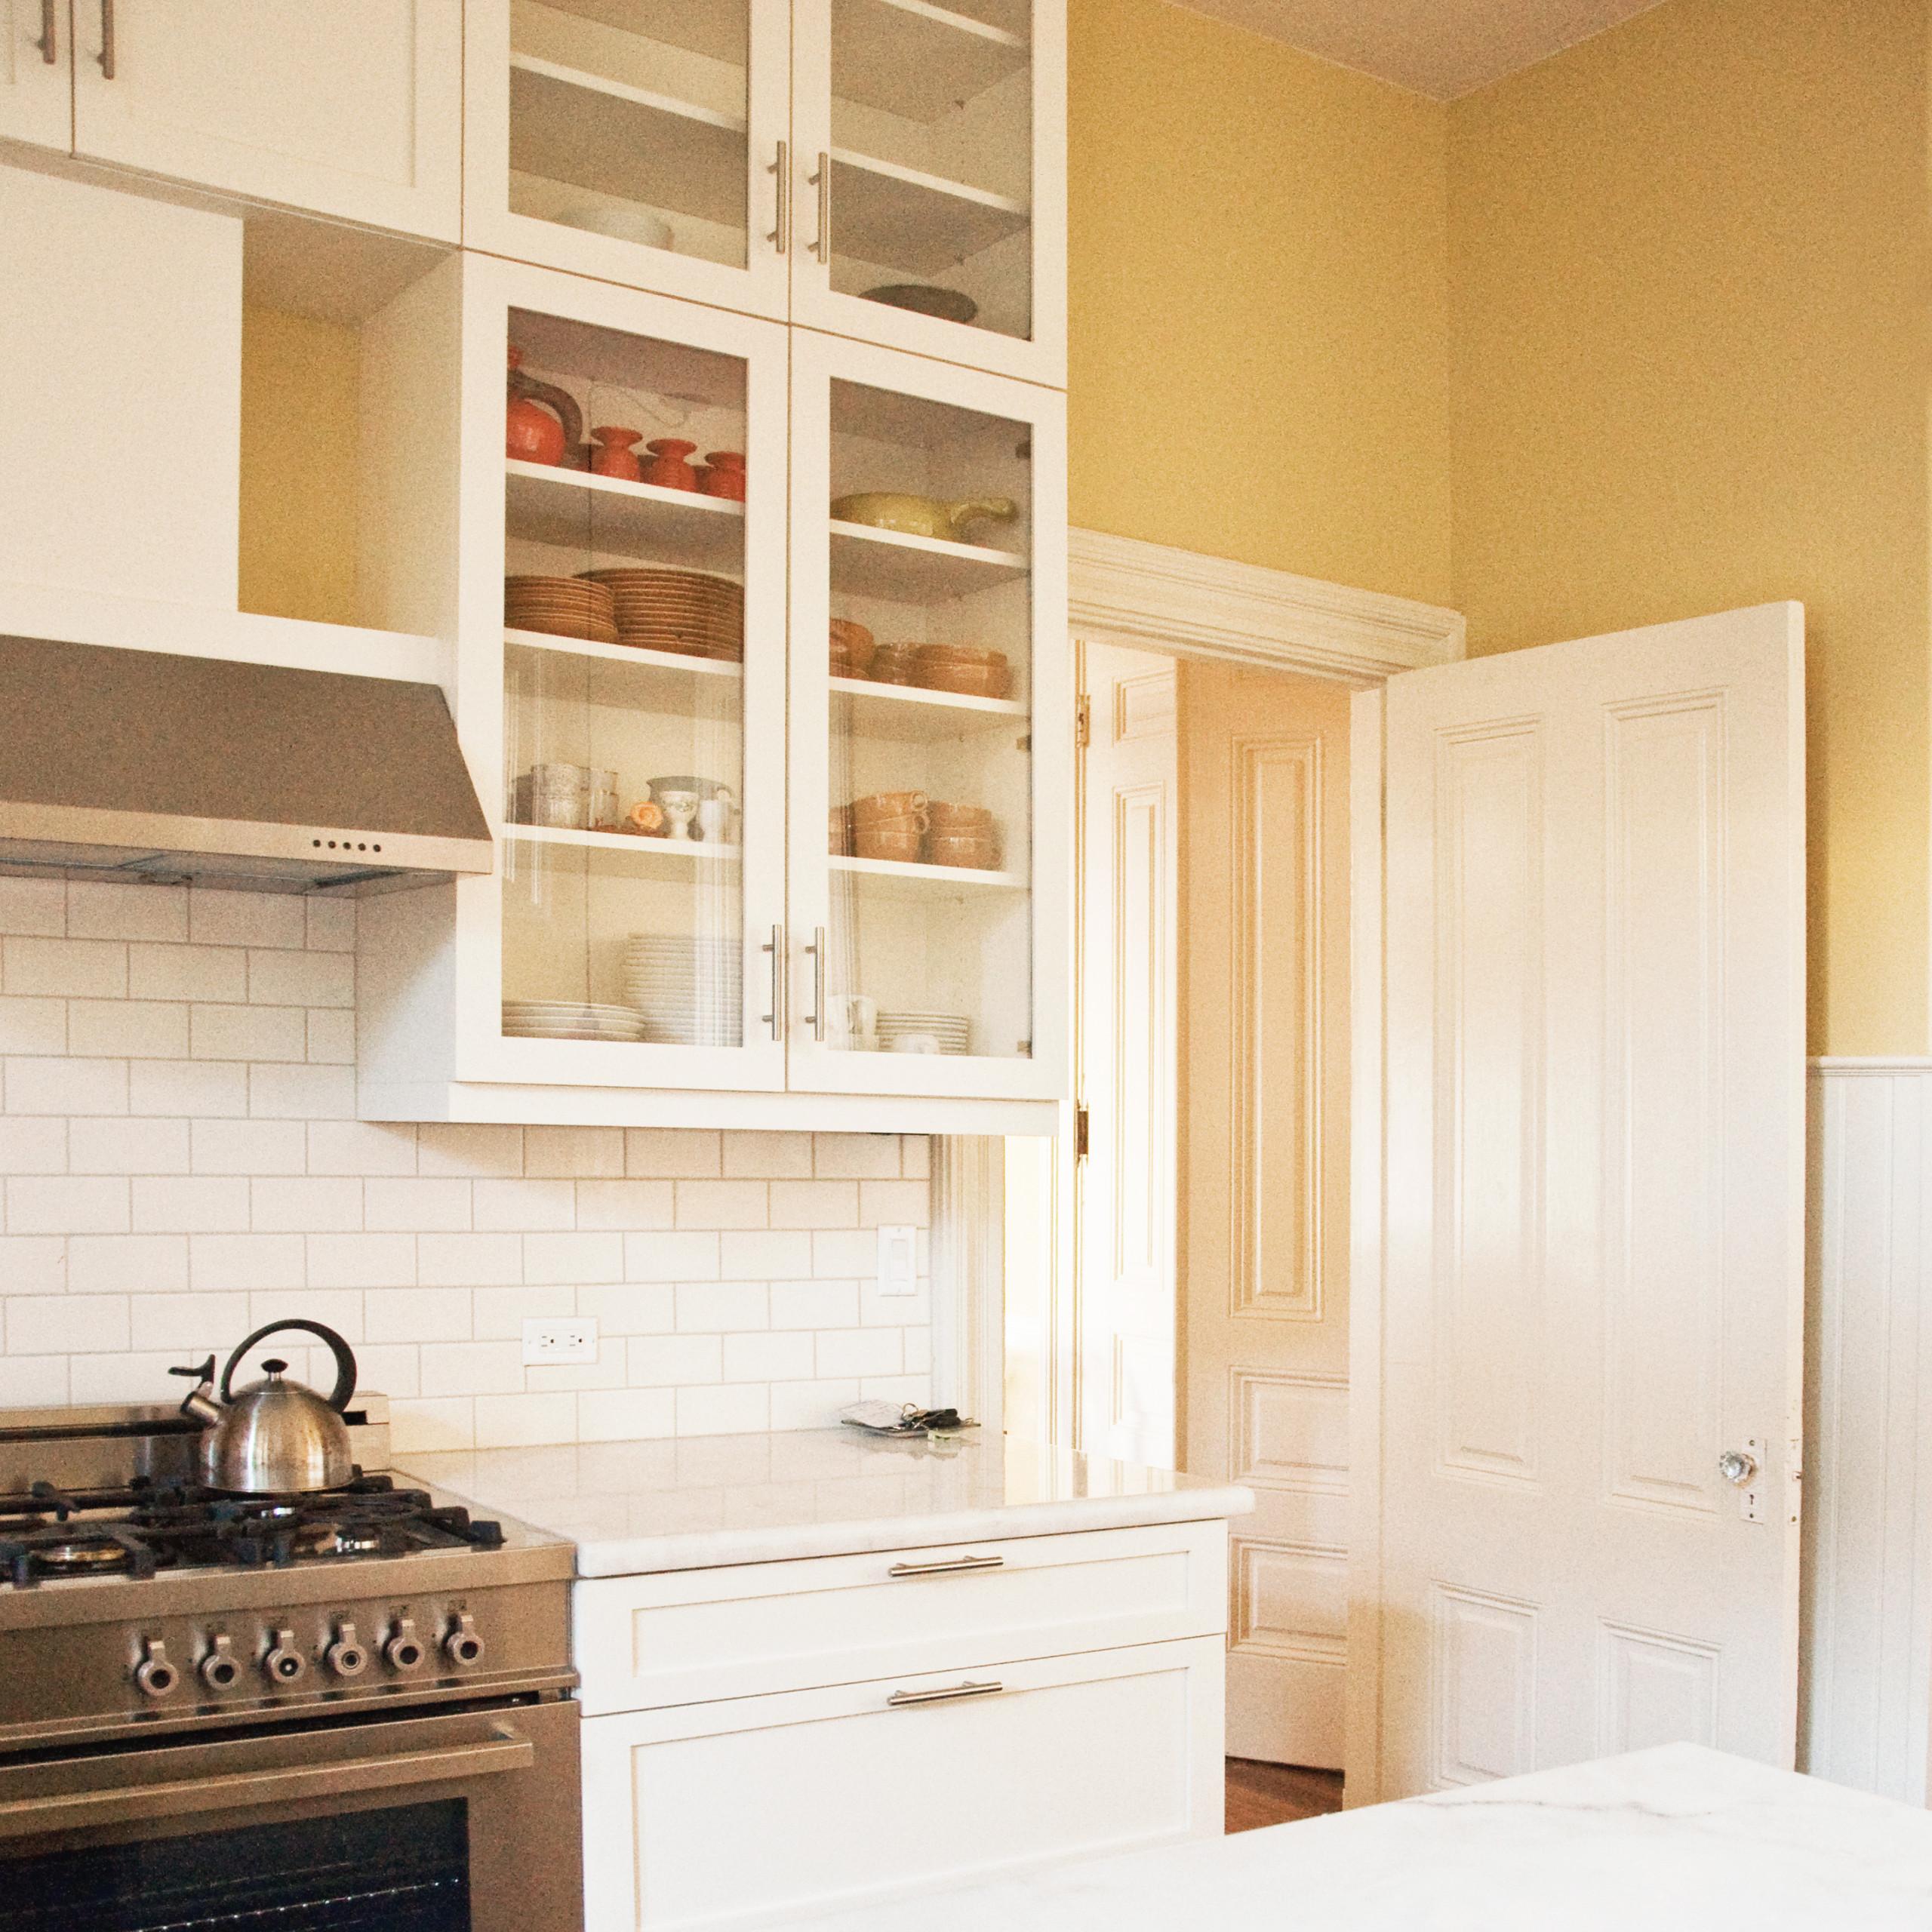 Liberty Hill Kitchen Remodel